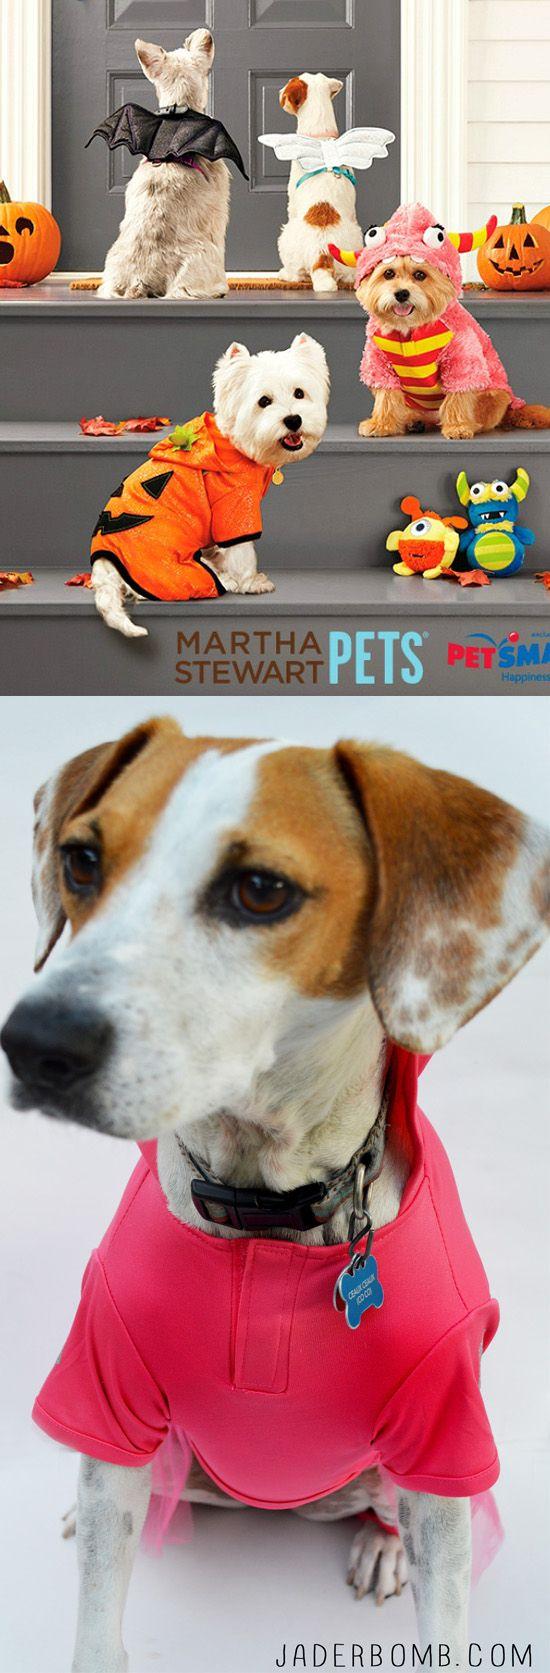 Martha Stewart Pets Halloween Costume Contest WWW.JADERBOMB.COM